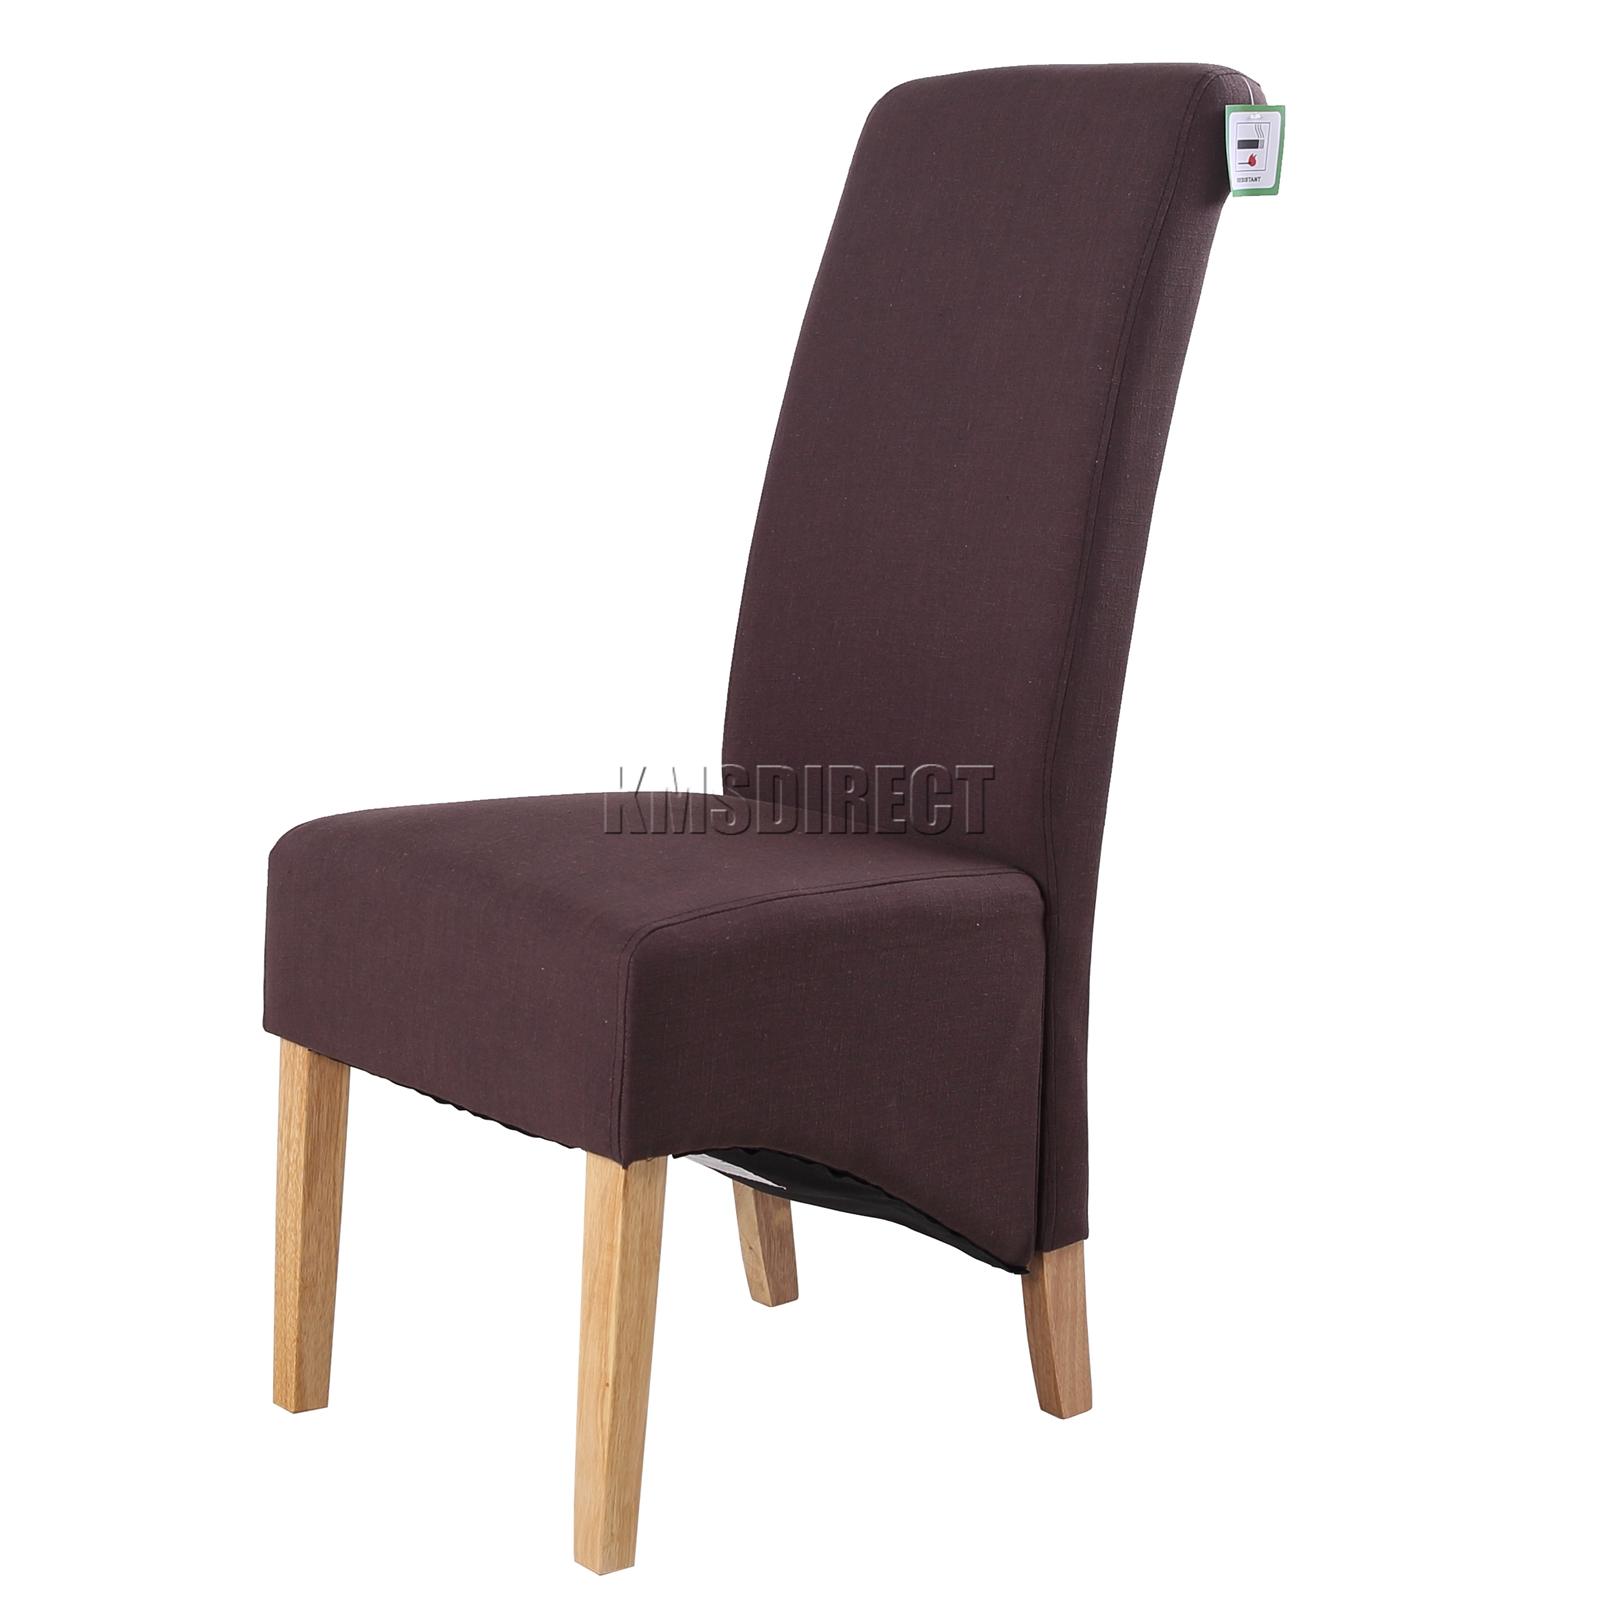 Foxhunter f01 marron chaise salle manger doublure tissu rouleau dossier haut ebay - Chaise haut dossier salle a manger ...